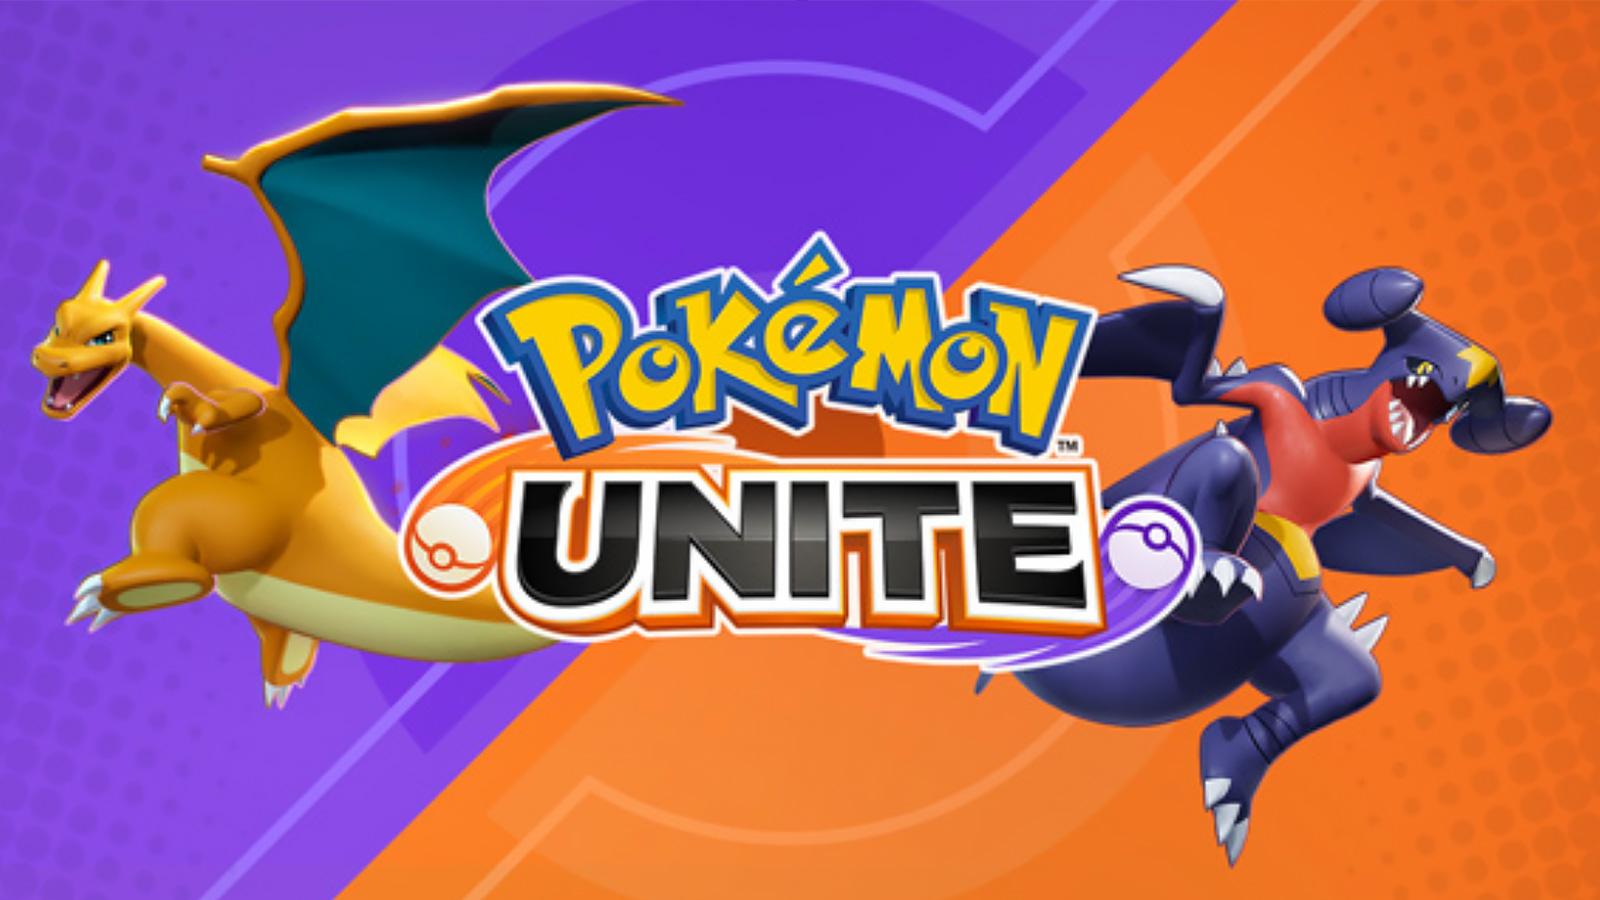 Screenshot of Charizard and Garchomp with Pokemon Unite logo.